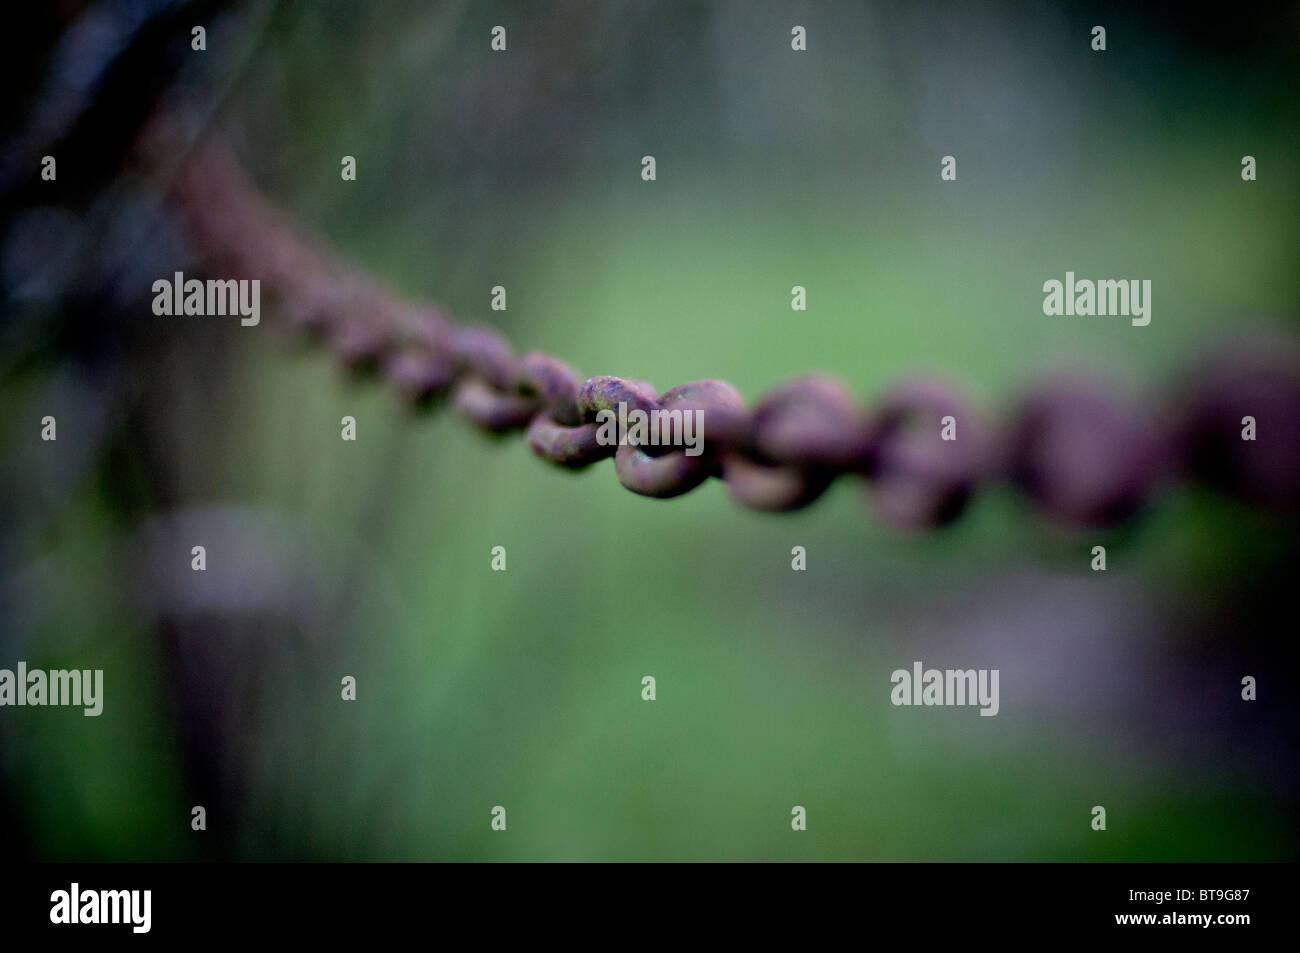 Una fuerte cadena de metal Imagen De Stock